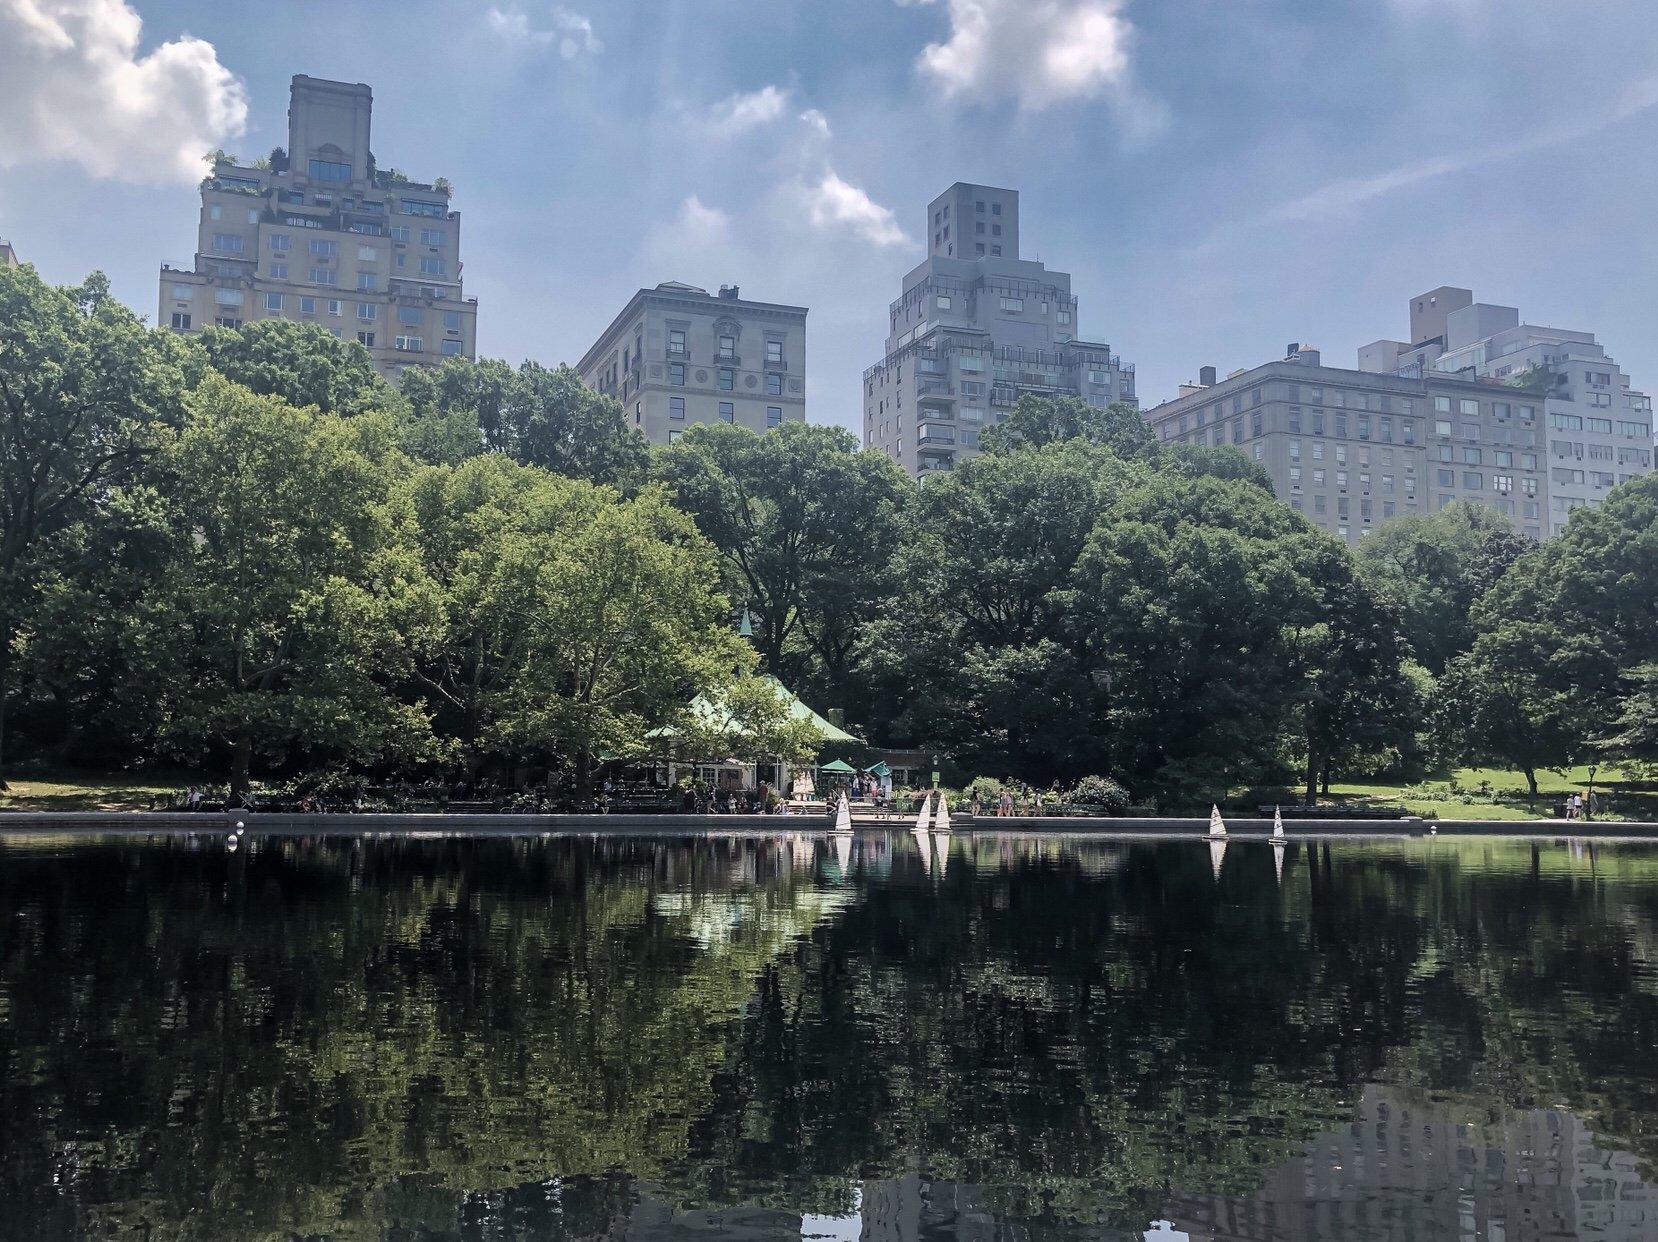 4 Tage in New York City - Central Park - Nowshine Reiseblog ü 40